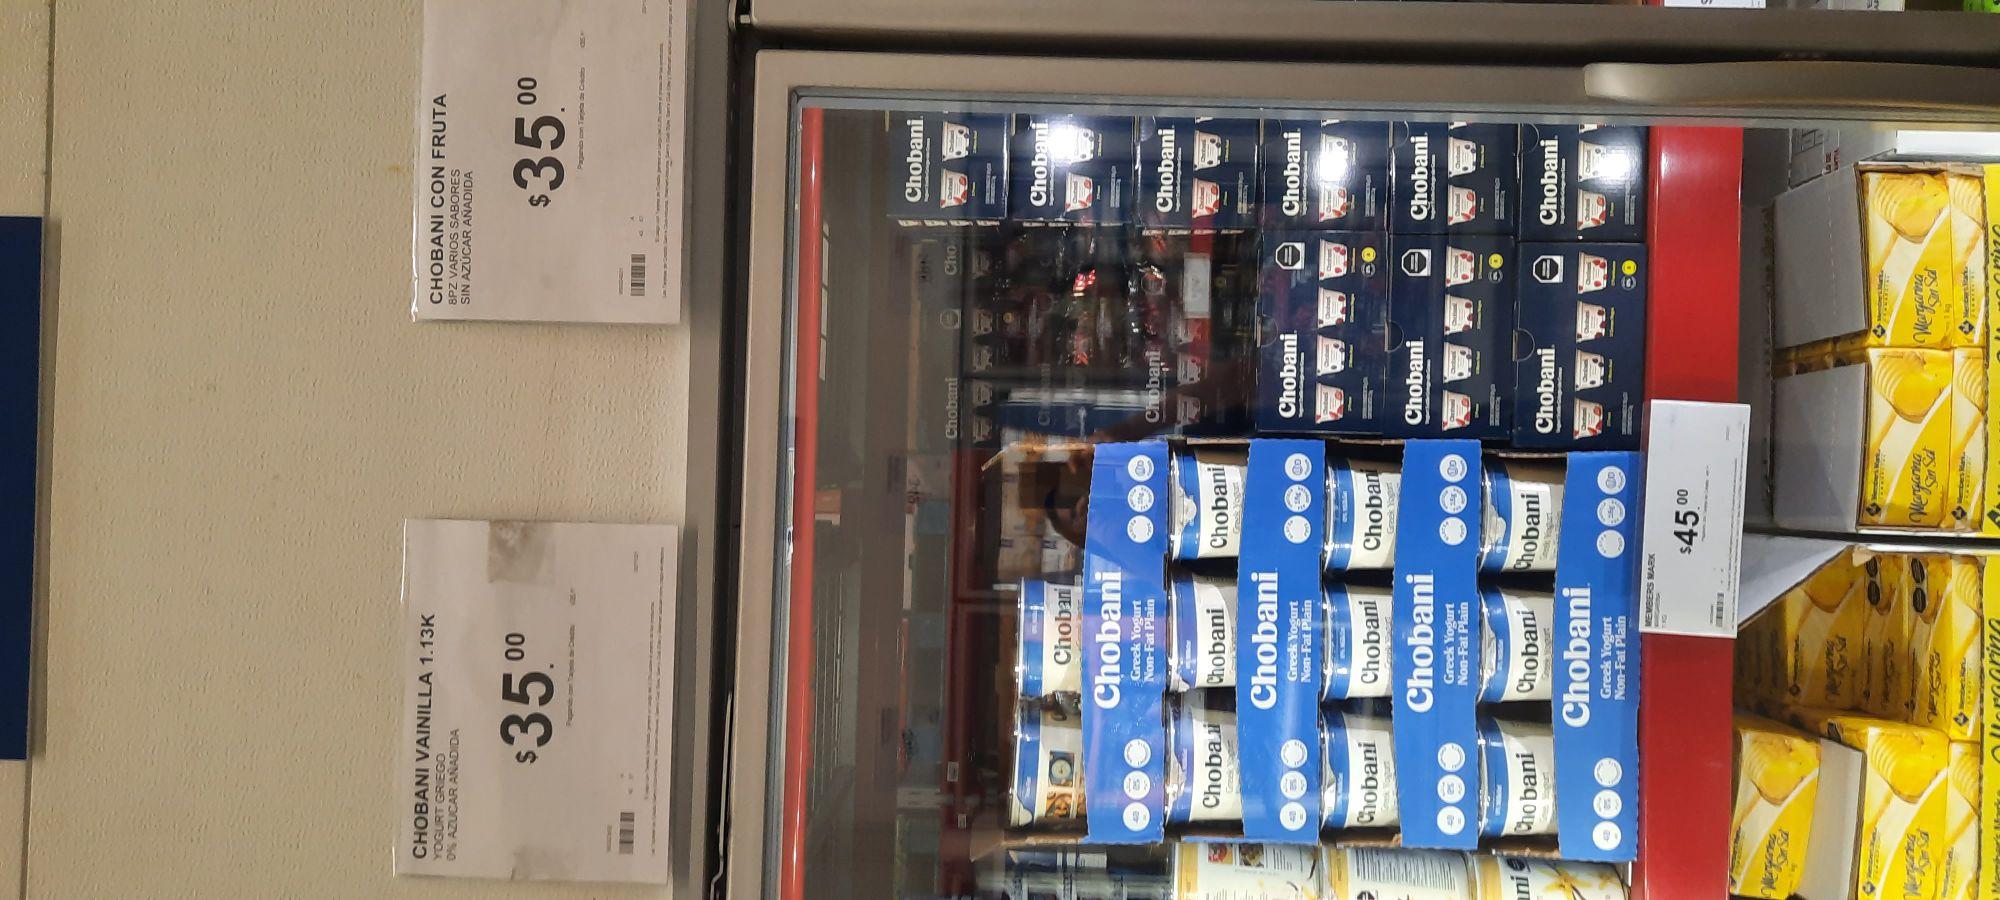 Sam's Club yogurth chobani a 35 pesos